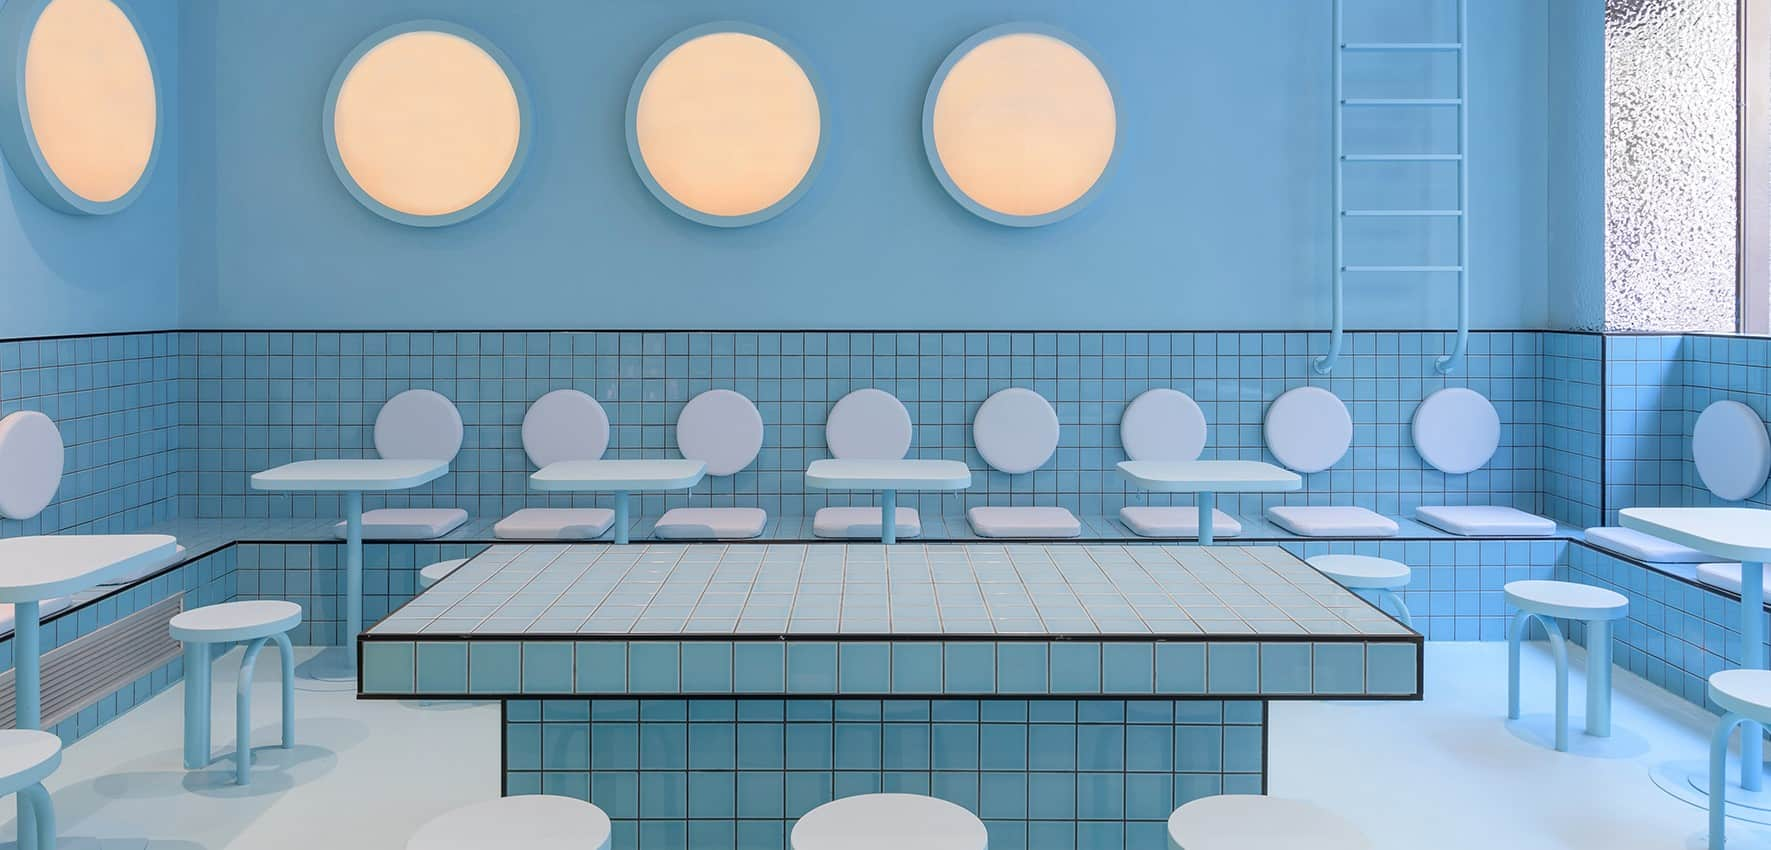 Bun Burgers Torino: un hamburger in piscina